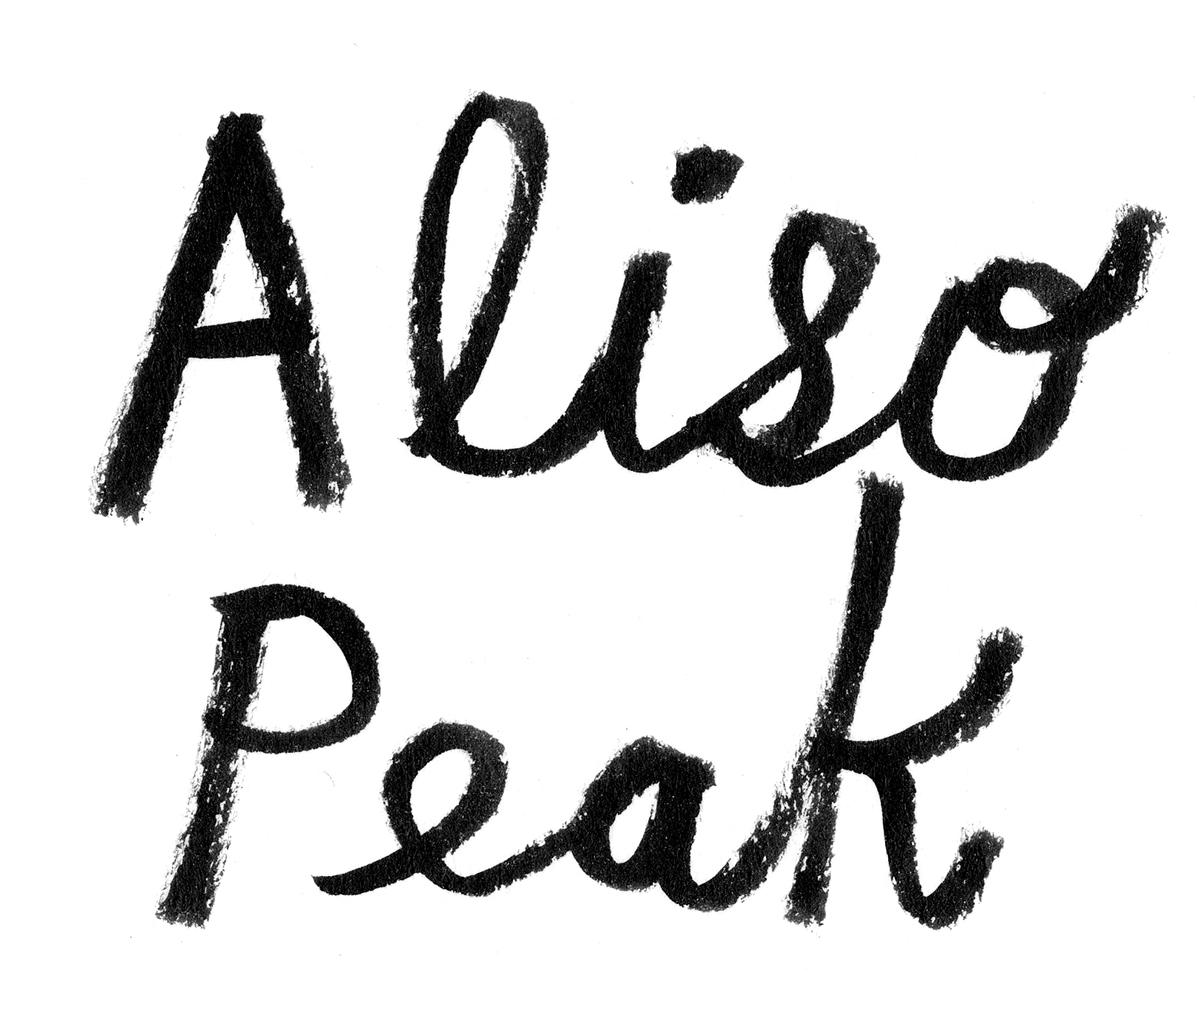 Aliso Peak